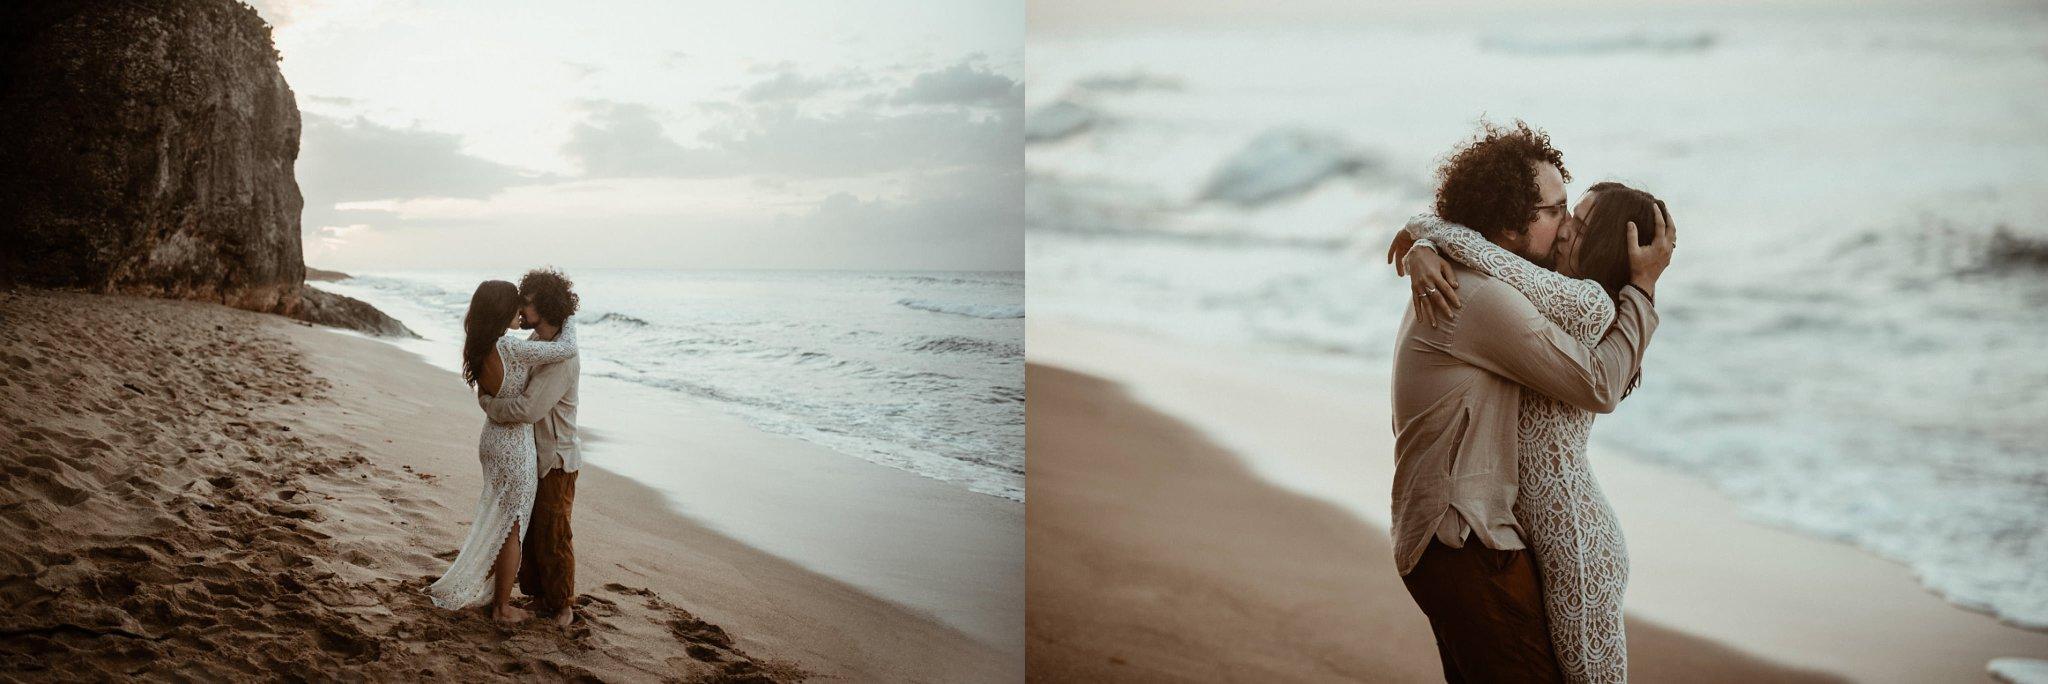 Puerto-Rico-Elopement_Lume-Photography-72.jpg